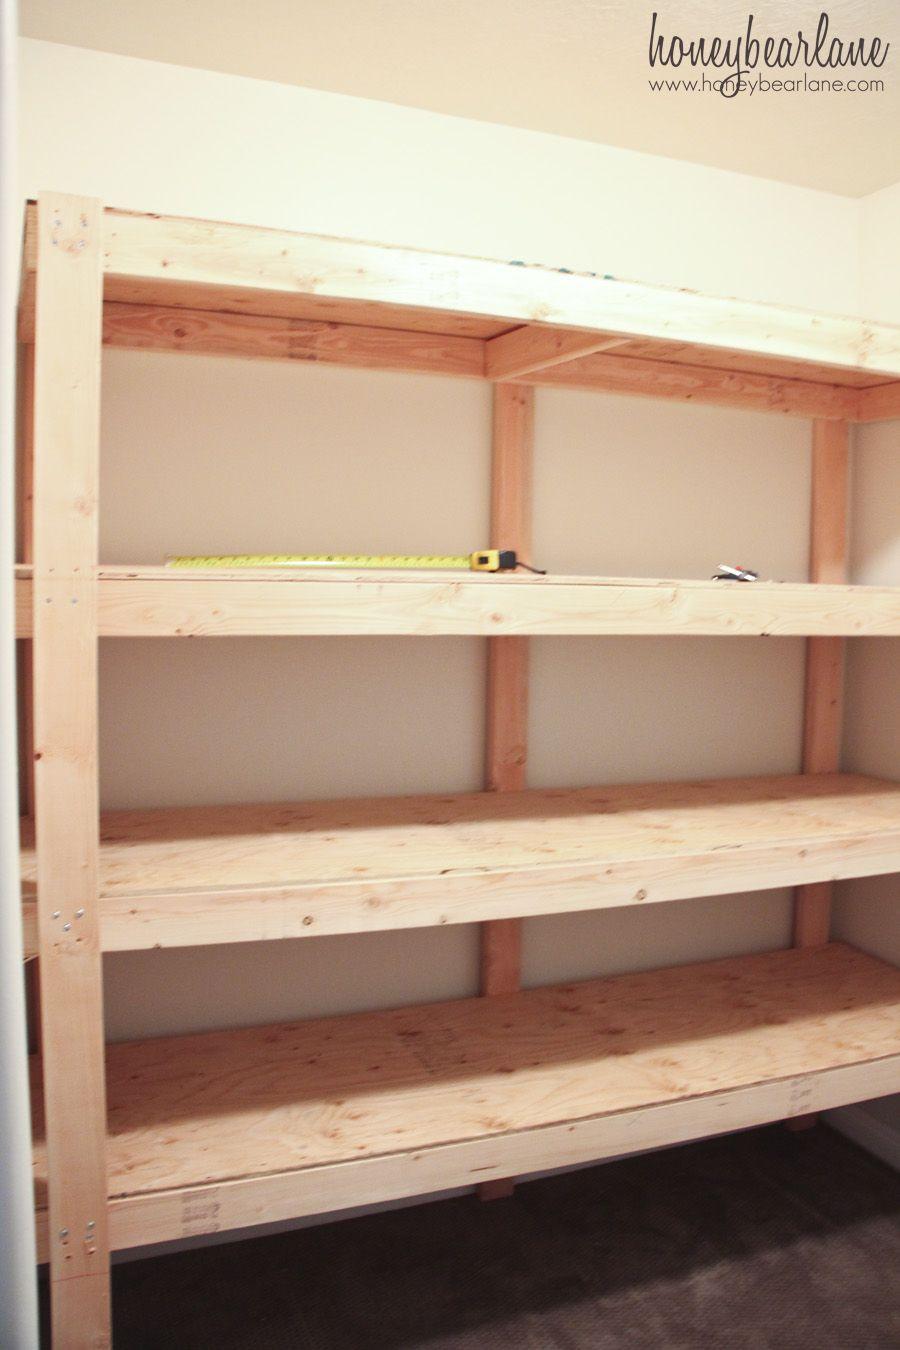 DIY Storage Shelves Diy storage shelves, Diy storage